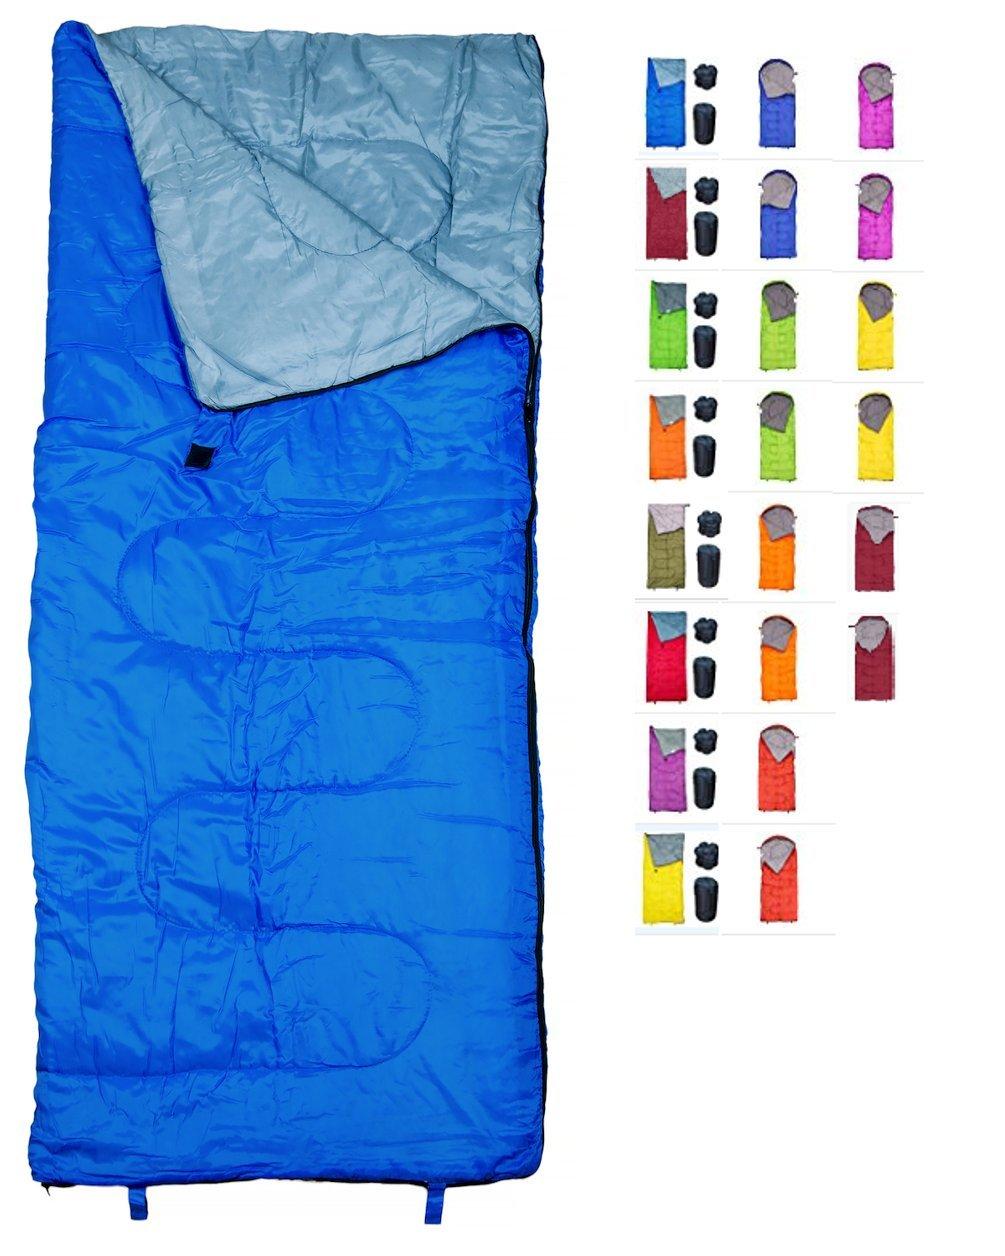 REVALCAMP Lightweight Sleeping Ultralight Backpacking